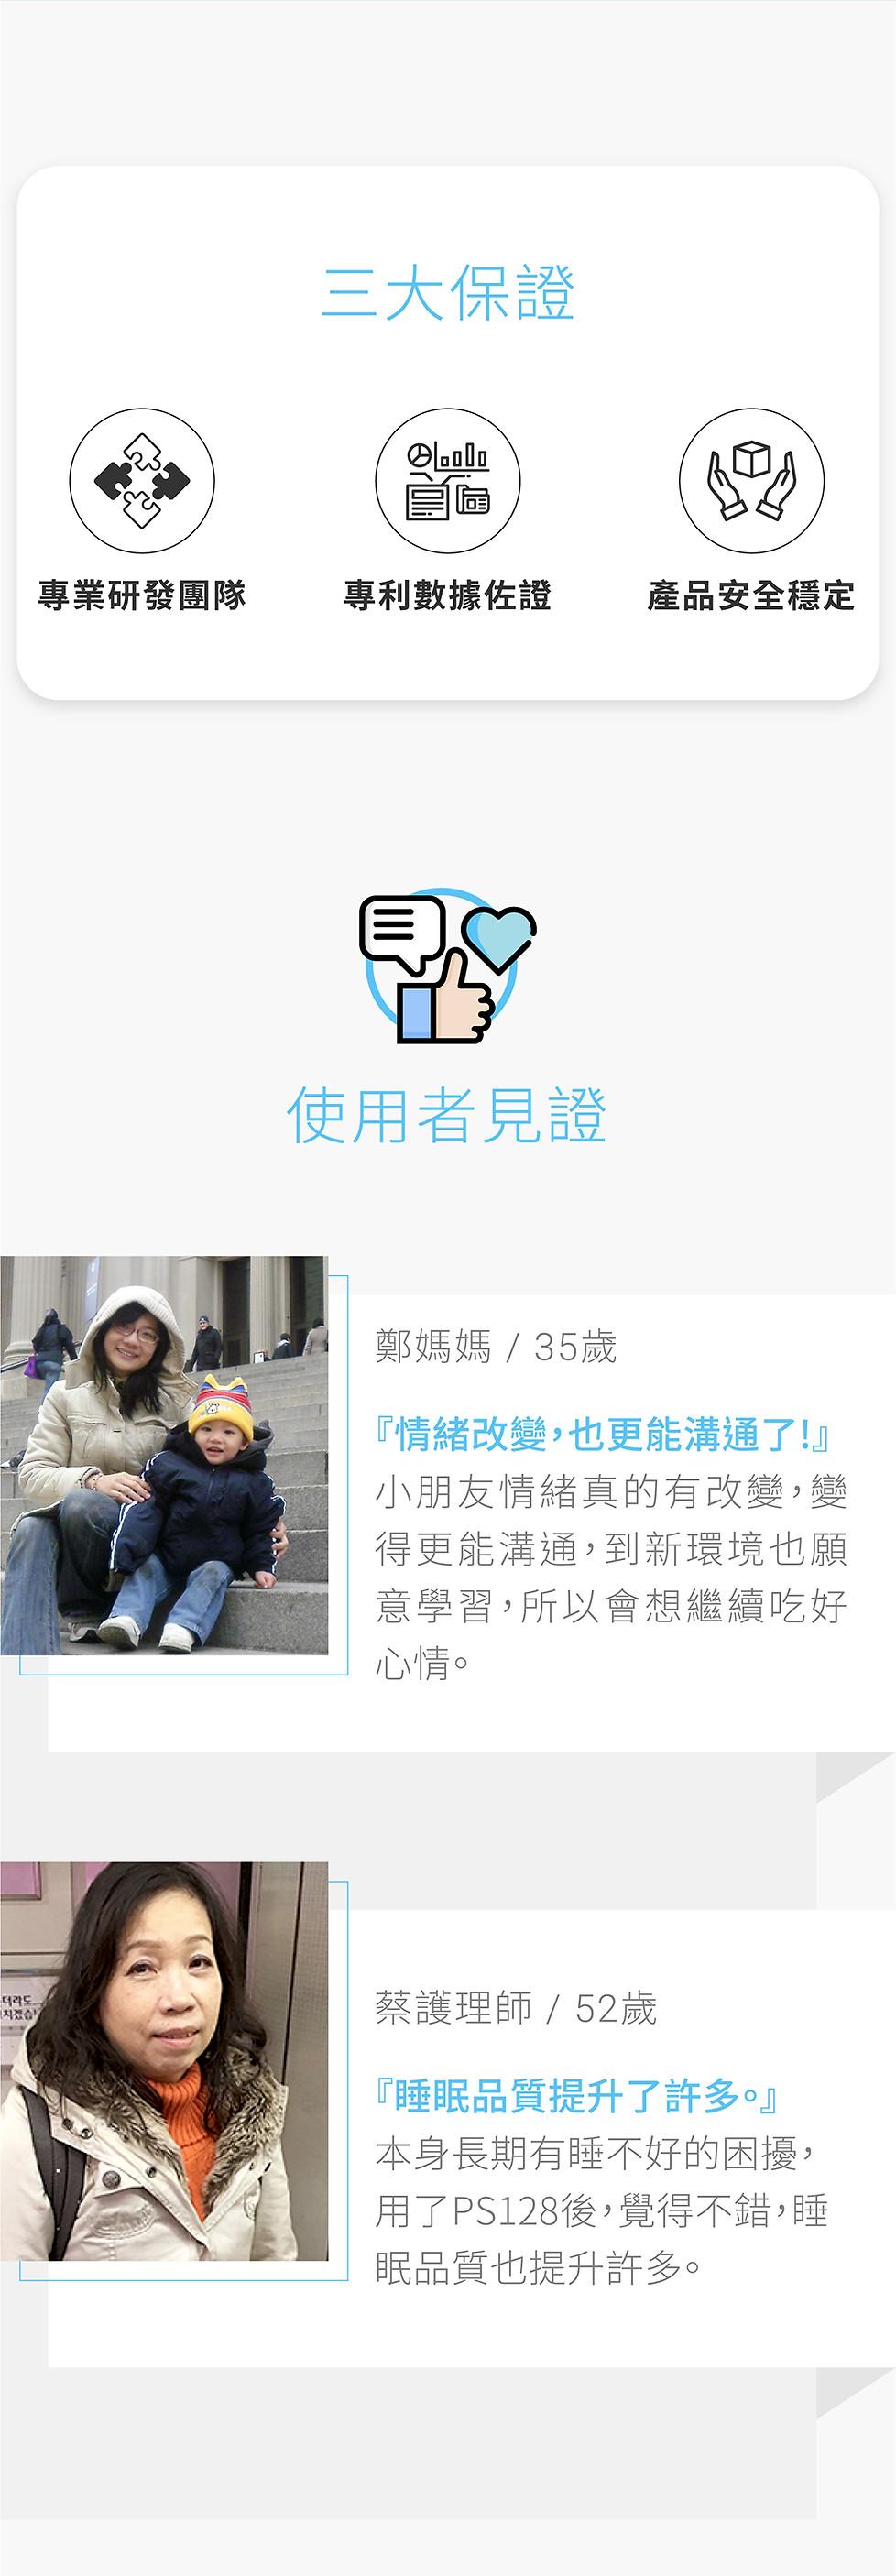 Productpage臨時版_好欣情_04.jpg